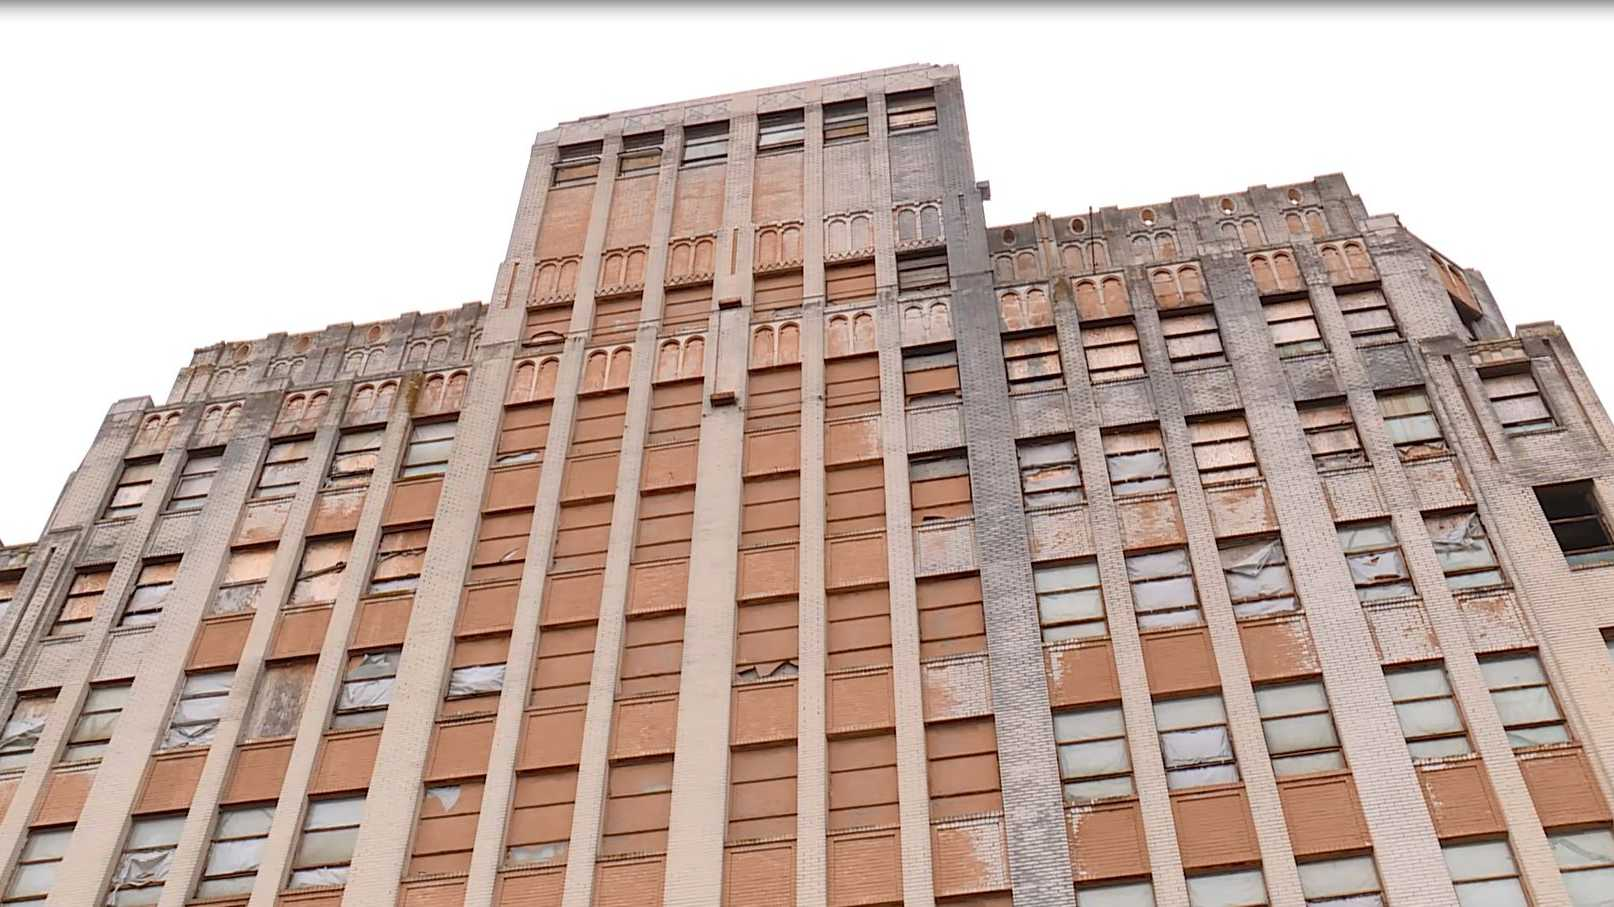 Ramsay-McCormick Building